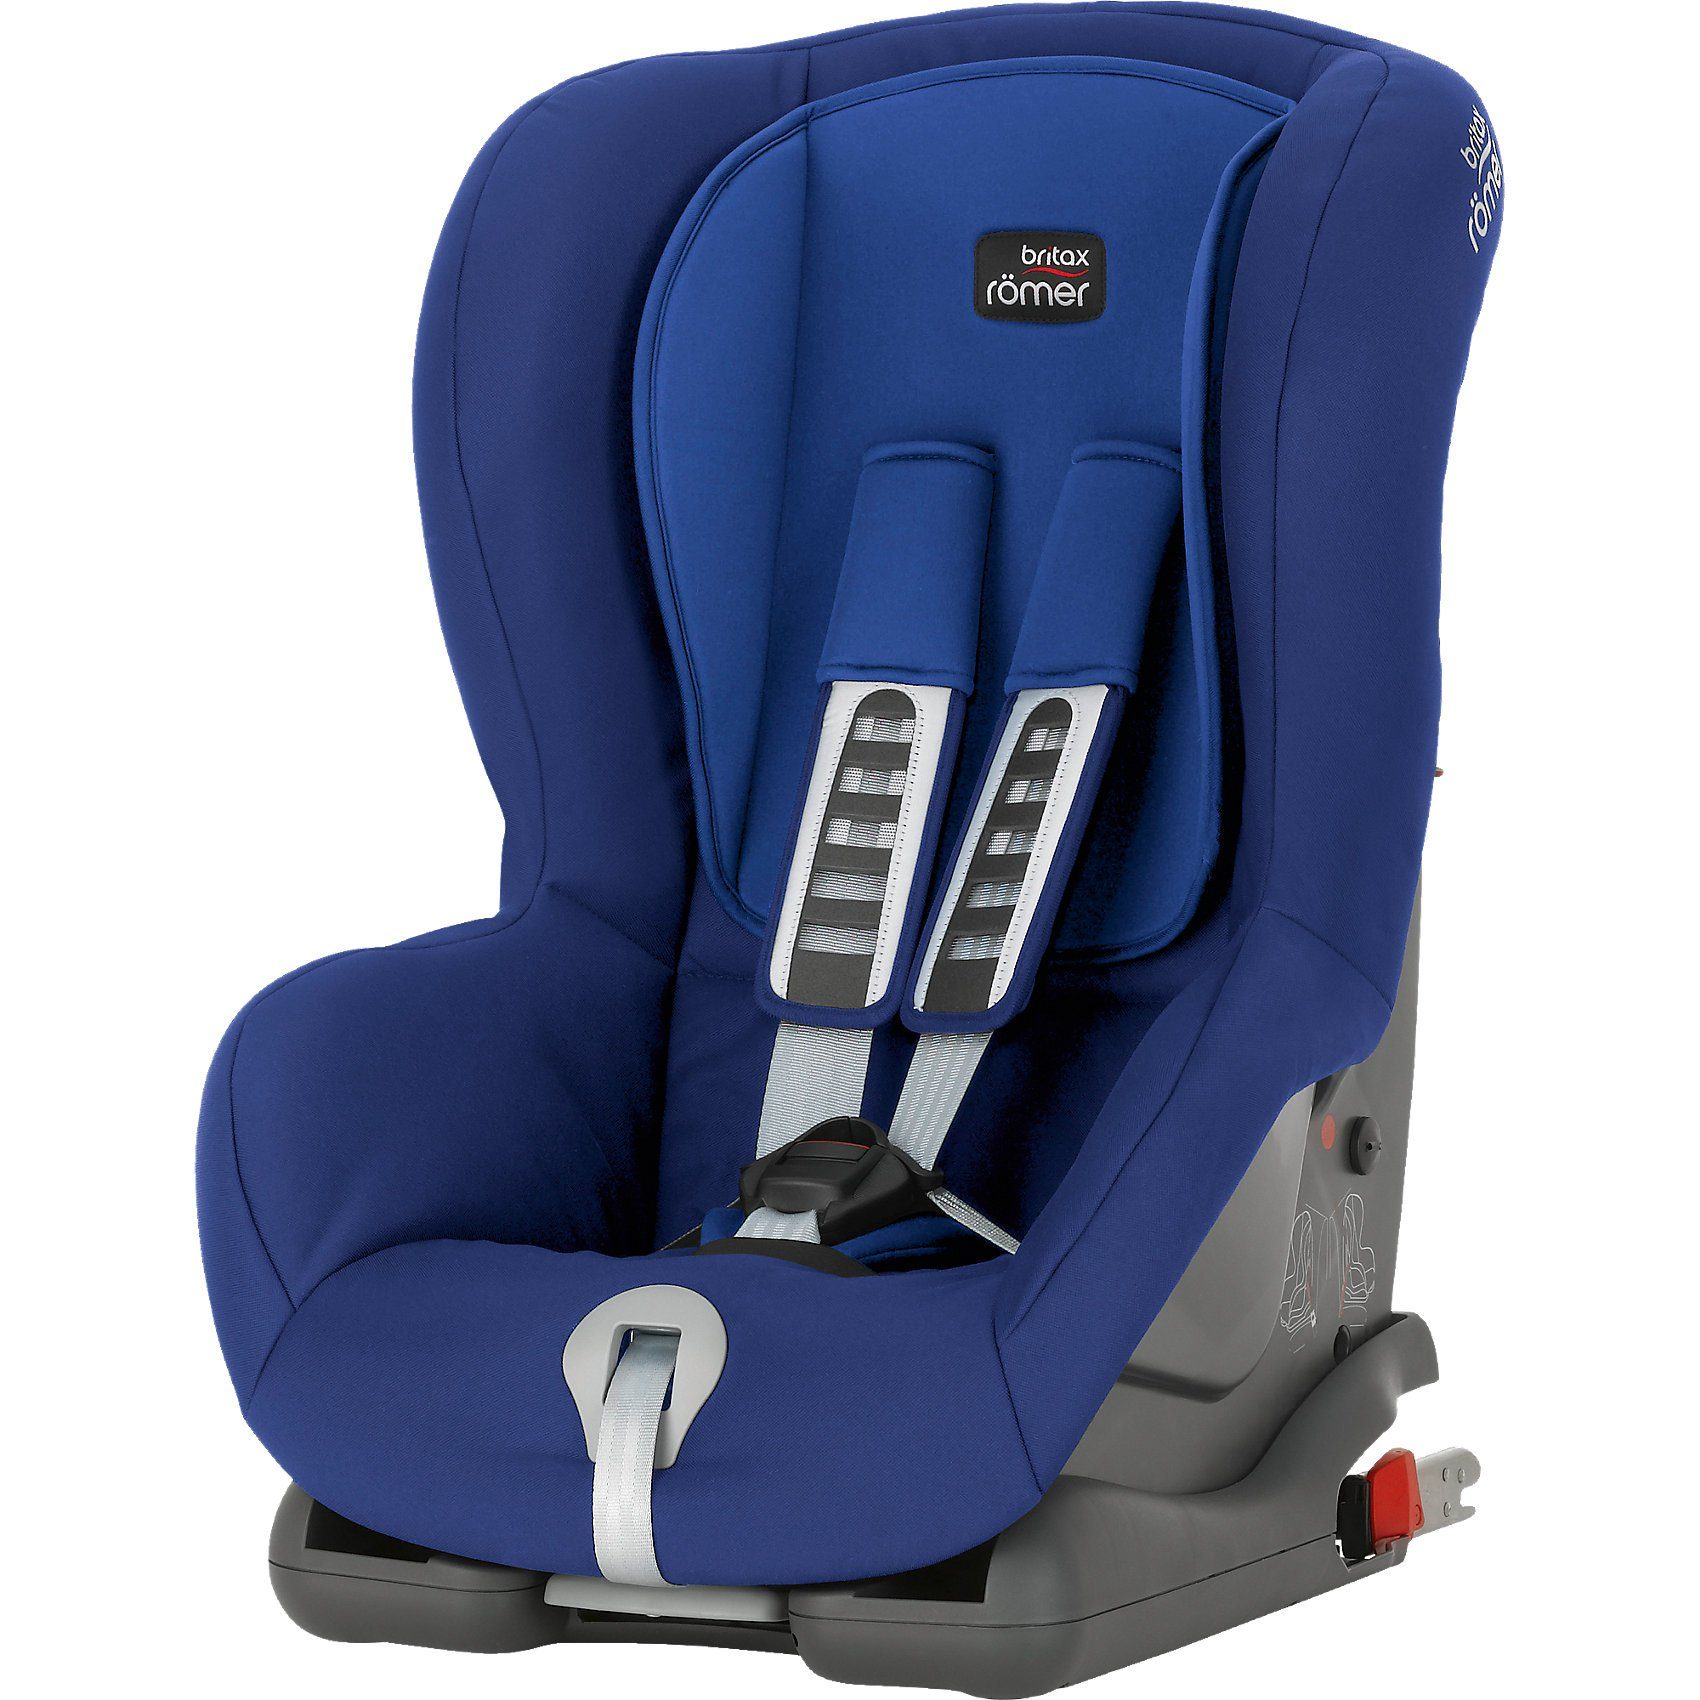 Britax Römer Auto-Kindersitz Duo Plus, Ocean Blue, 2016